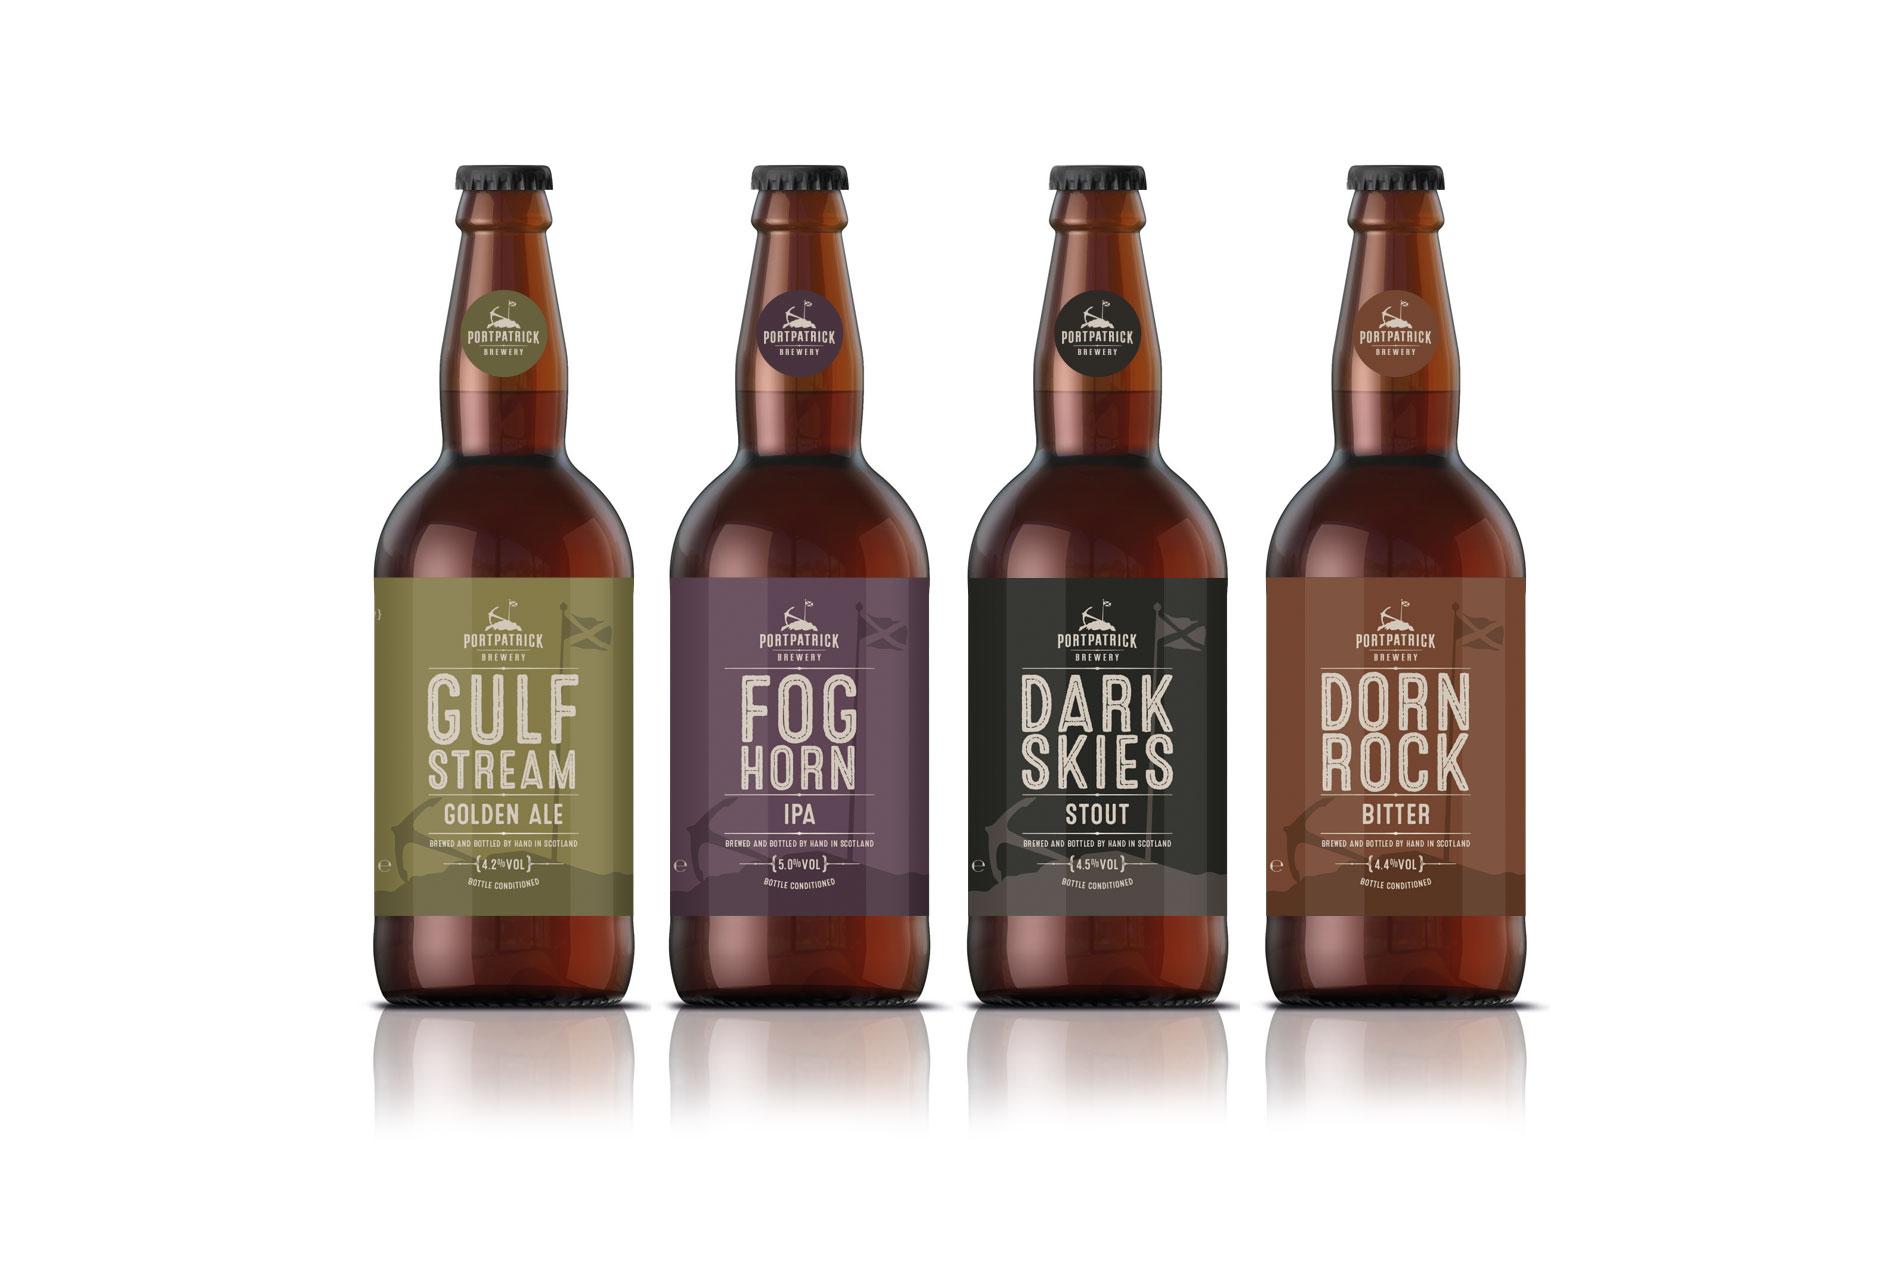 Portpatrick Brewery Beer Brand Label Designs